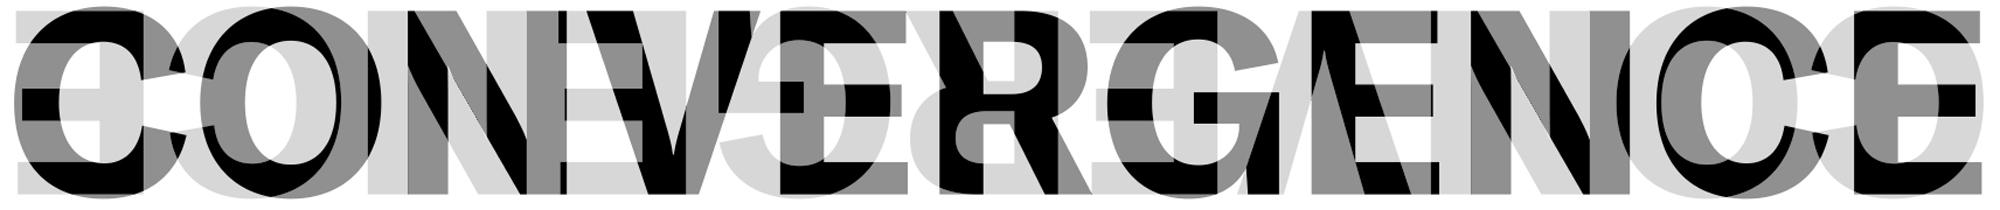 Convergence.ID.Final-8.jpg